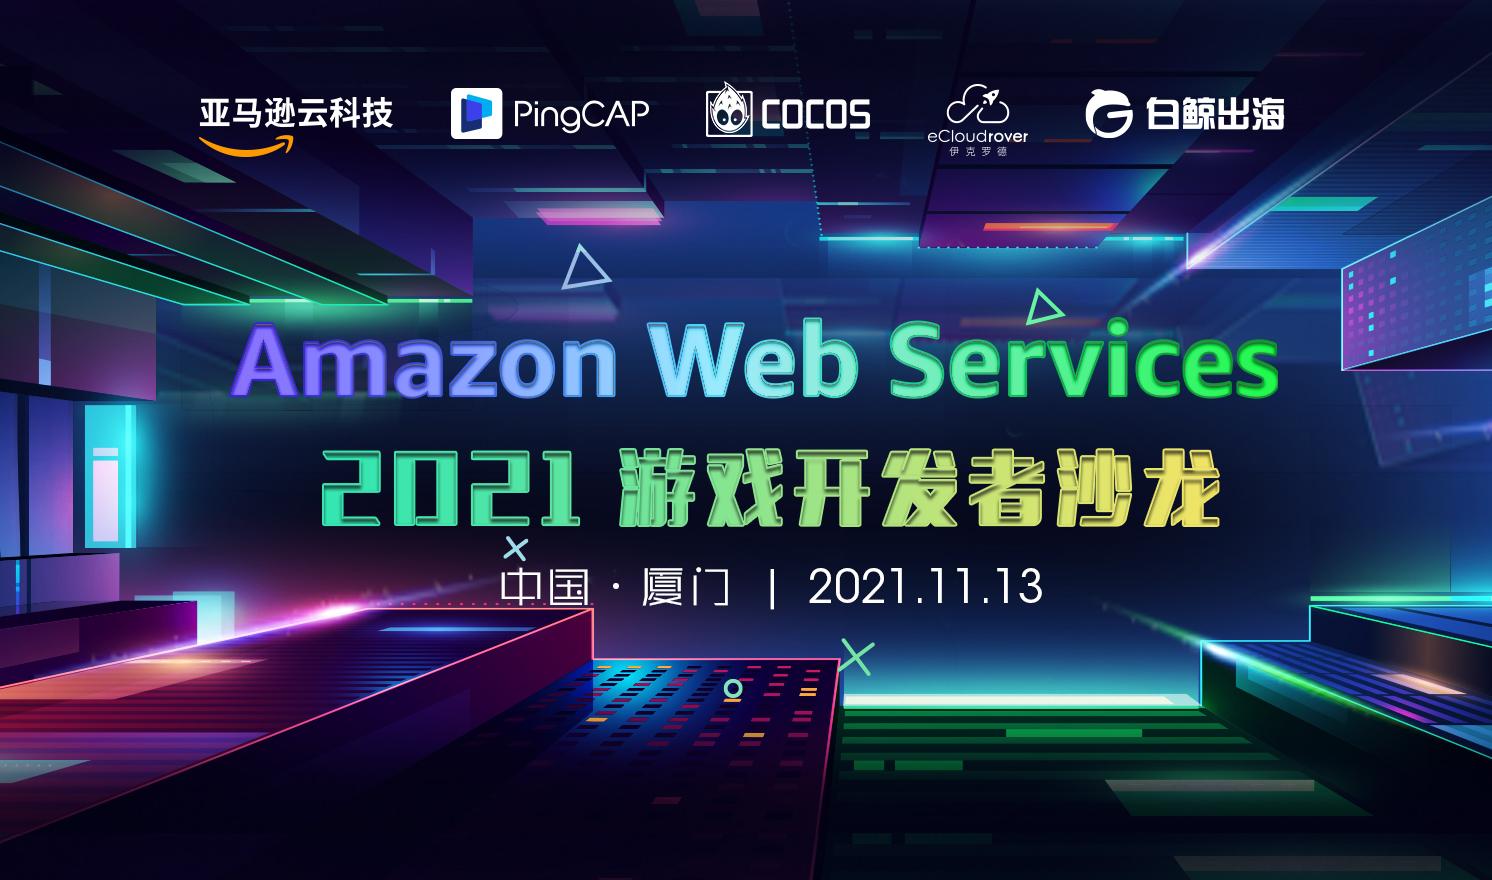 Amazon Web Services  2021游戏开发者沙龙(2021-11-13)